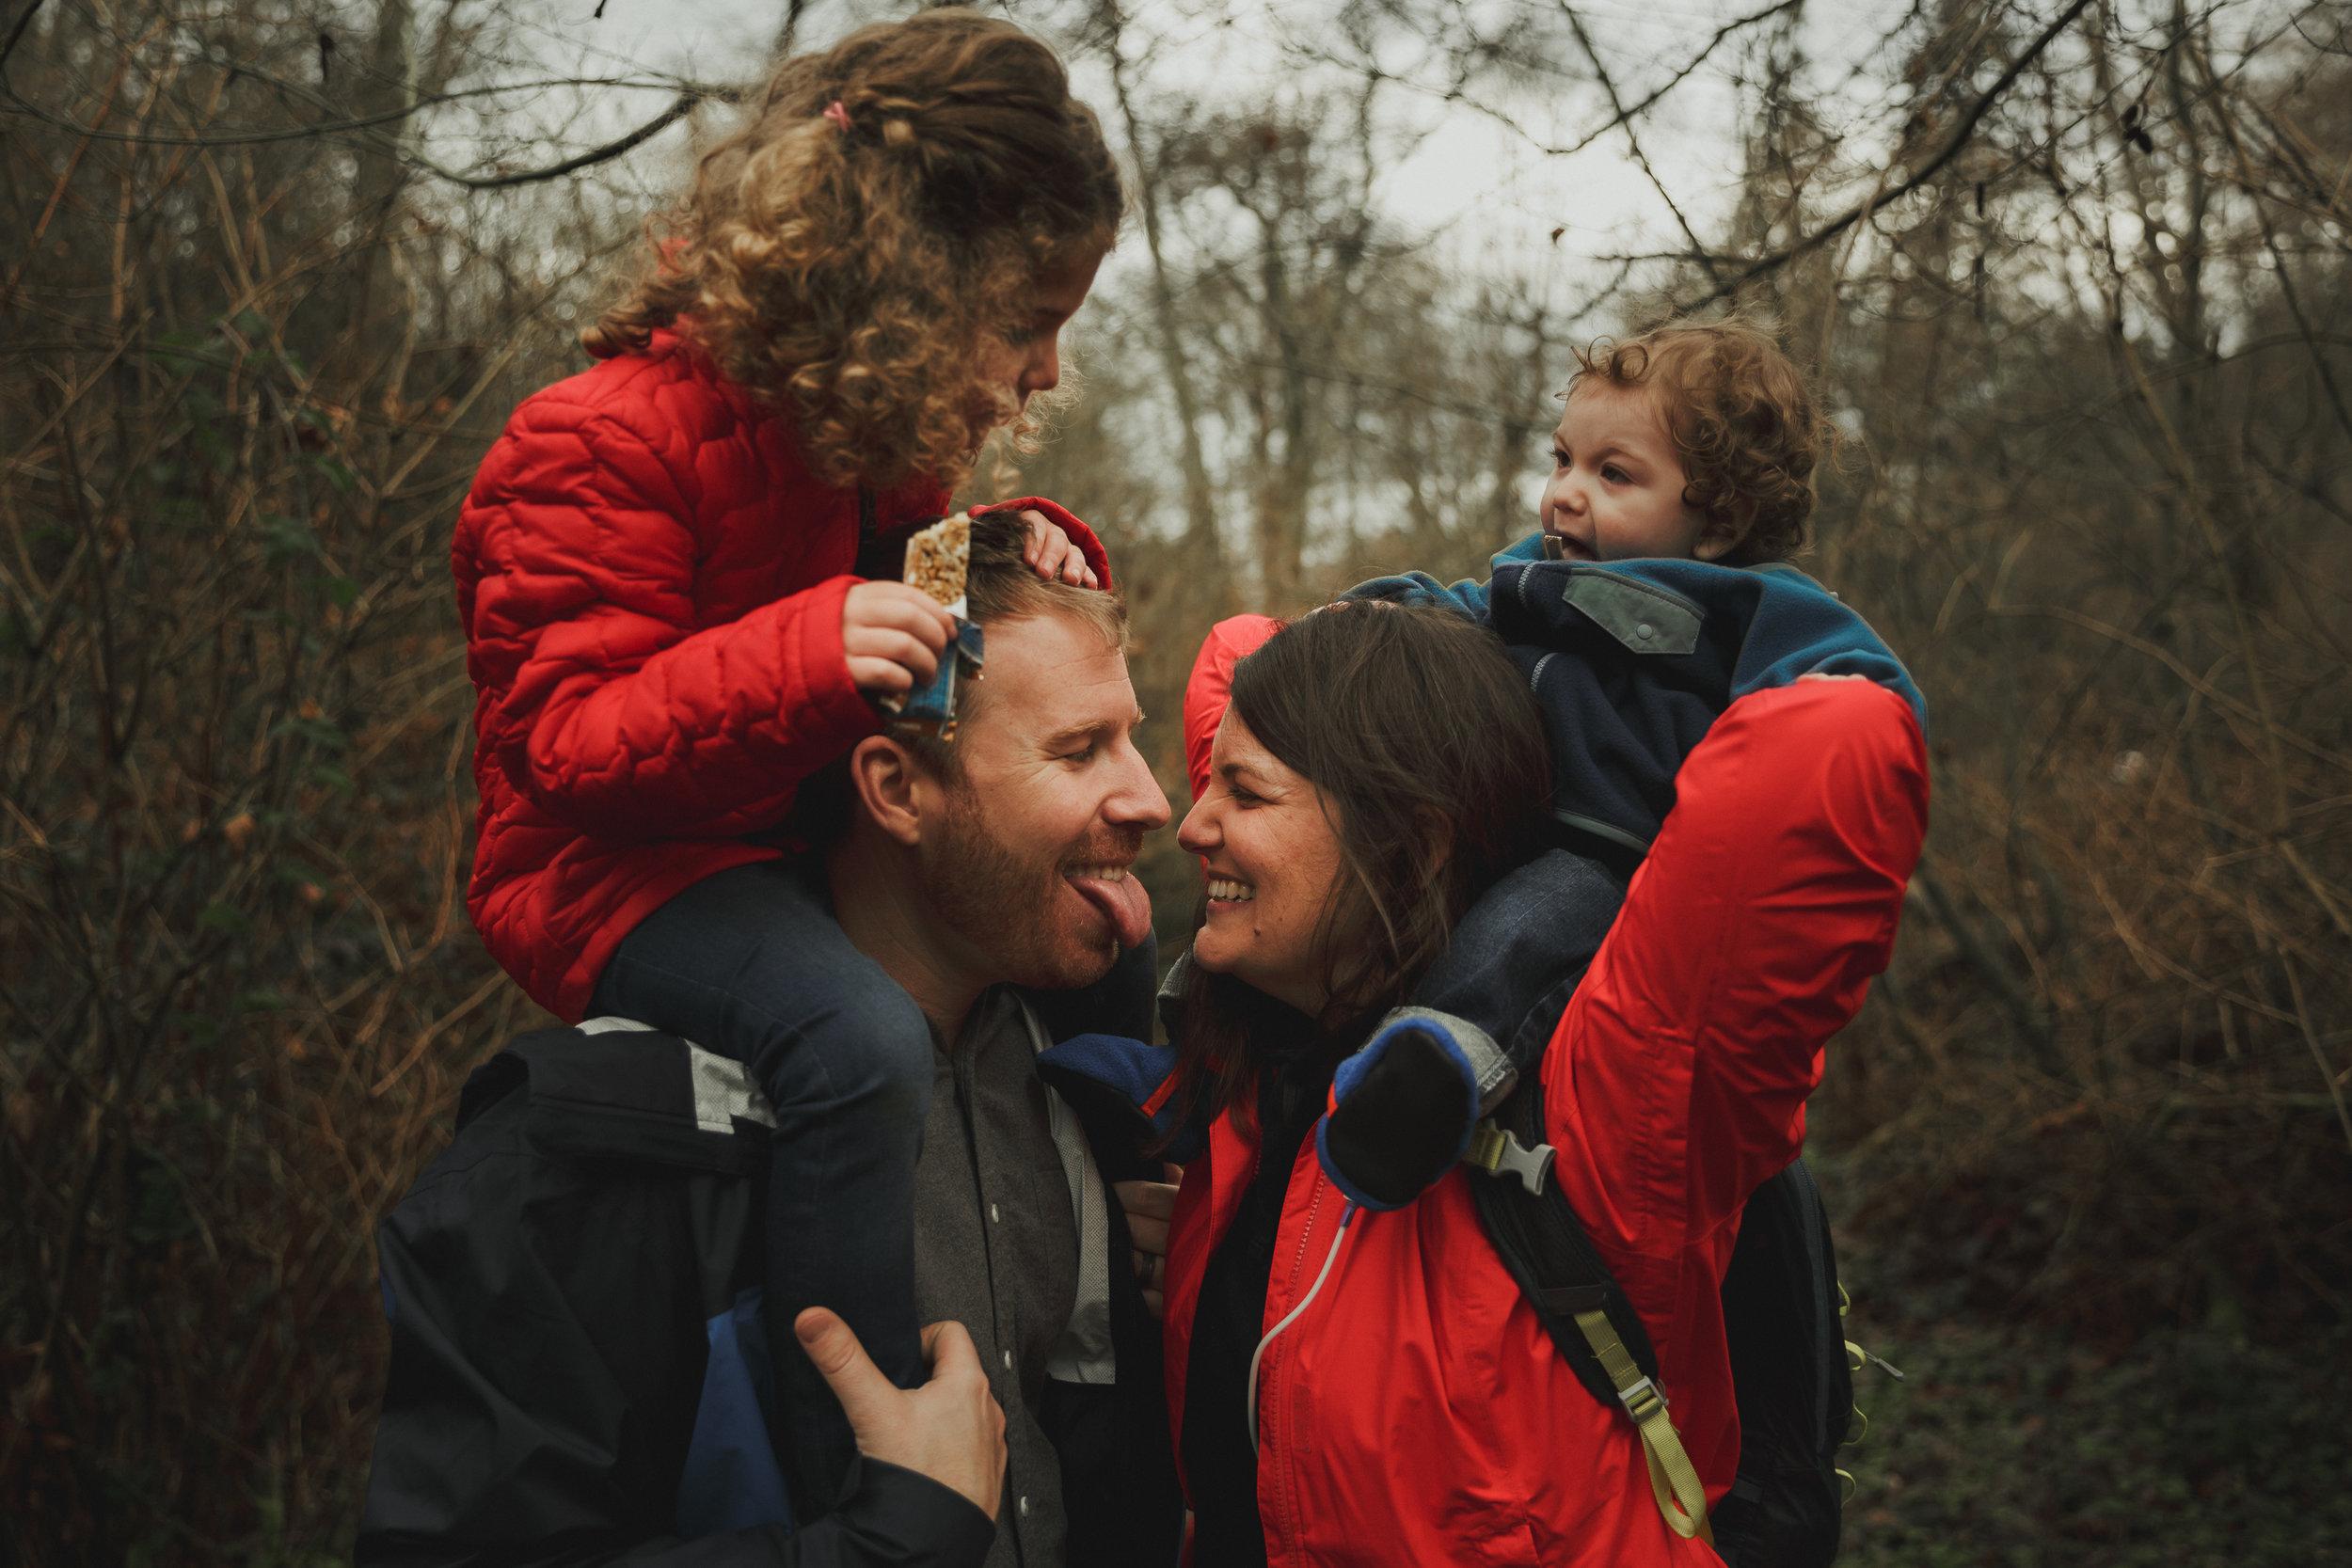 seattlefamilyphotos-mckeever-2019-kristawelch-0101.jpg